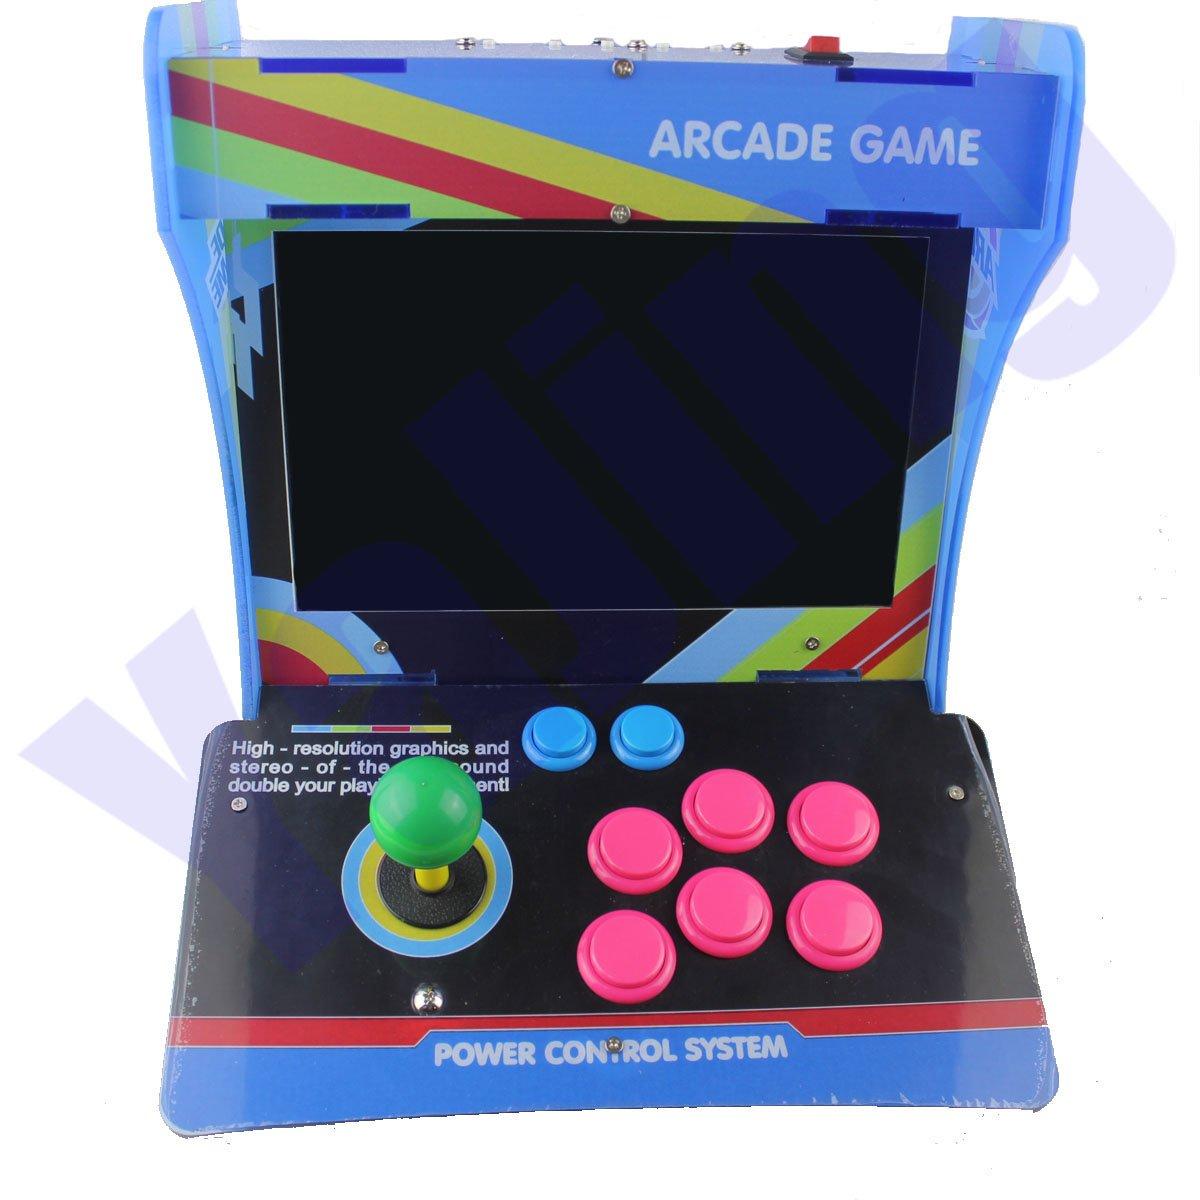 "Retro Mini Arcade Machine with 1388 Classic Video Games, One Player Pandora Box 5s Plus Plug and Play Mini Arcade Game Cabinet Machine with 10.4"" Screen"